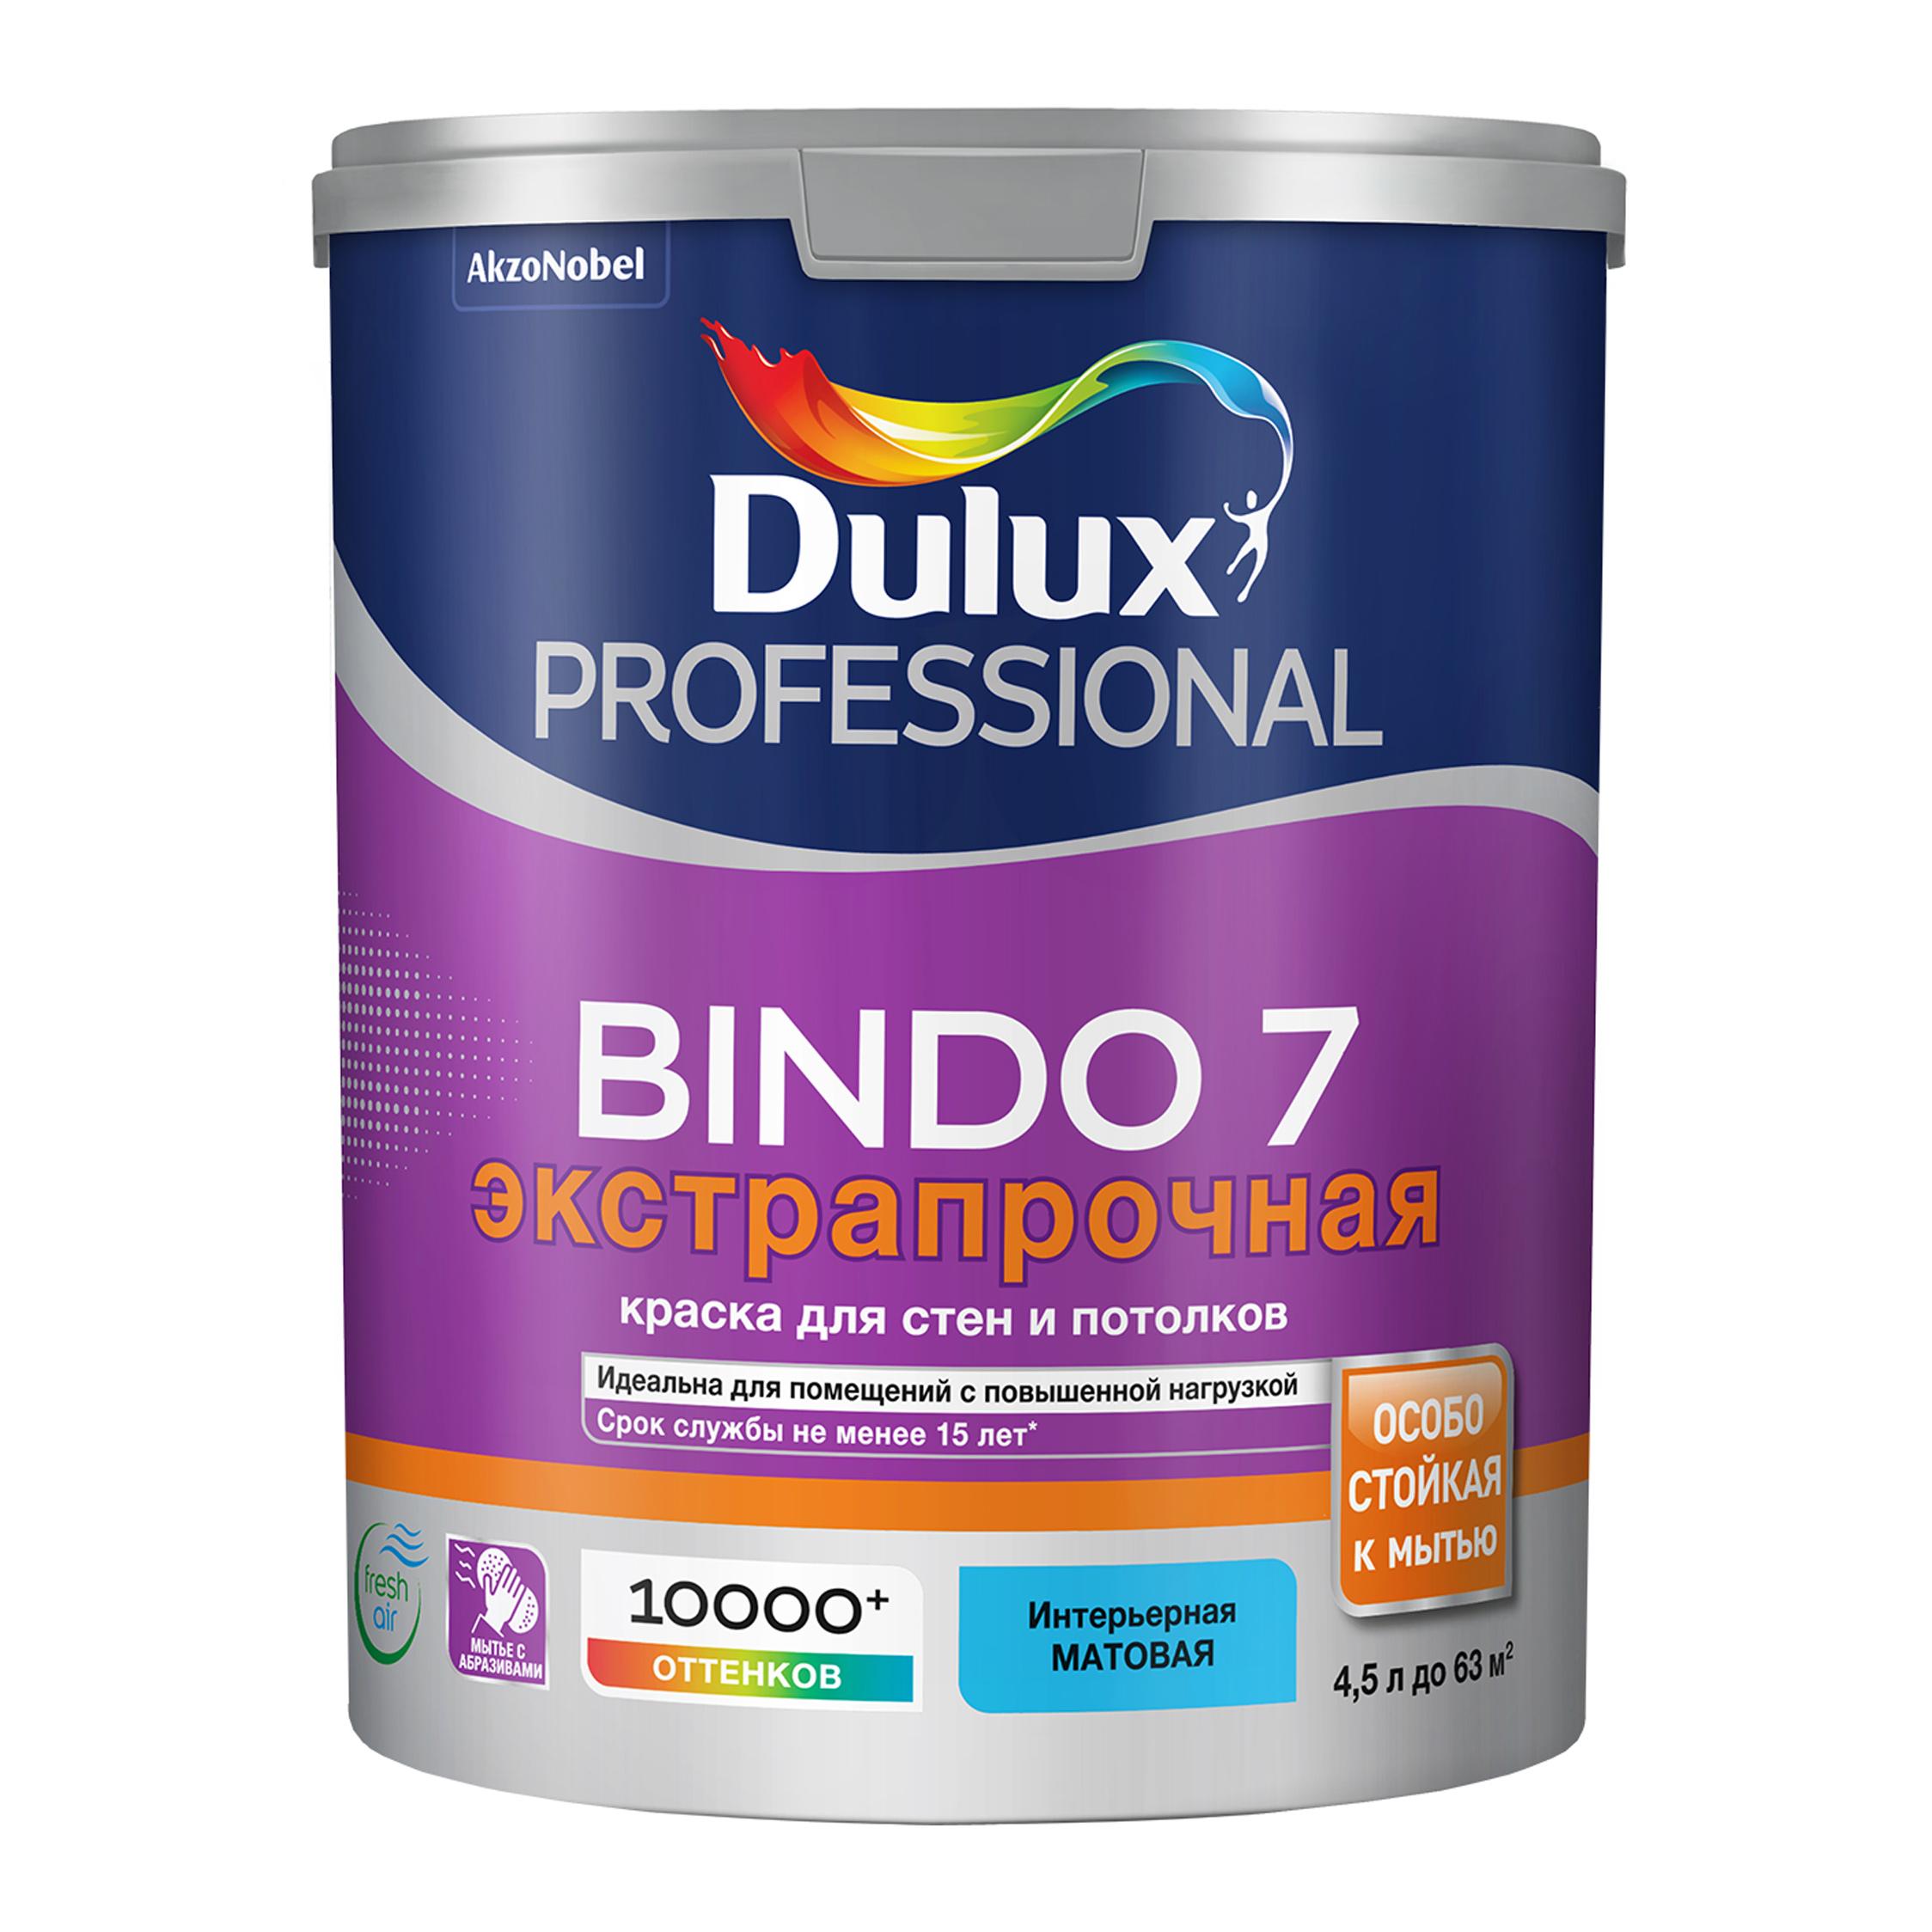 Фото - Краска для стен и потолков латексная экстрапрочная Dulux Professional Bindo 7 матовая база BW 4,5 л. краска водно дисперсионная dulux bindo 7 экстрапрочная моющаяся основа вс 1 л